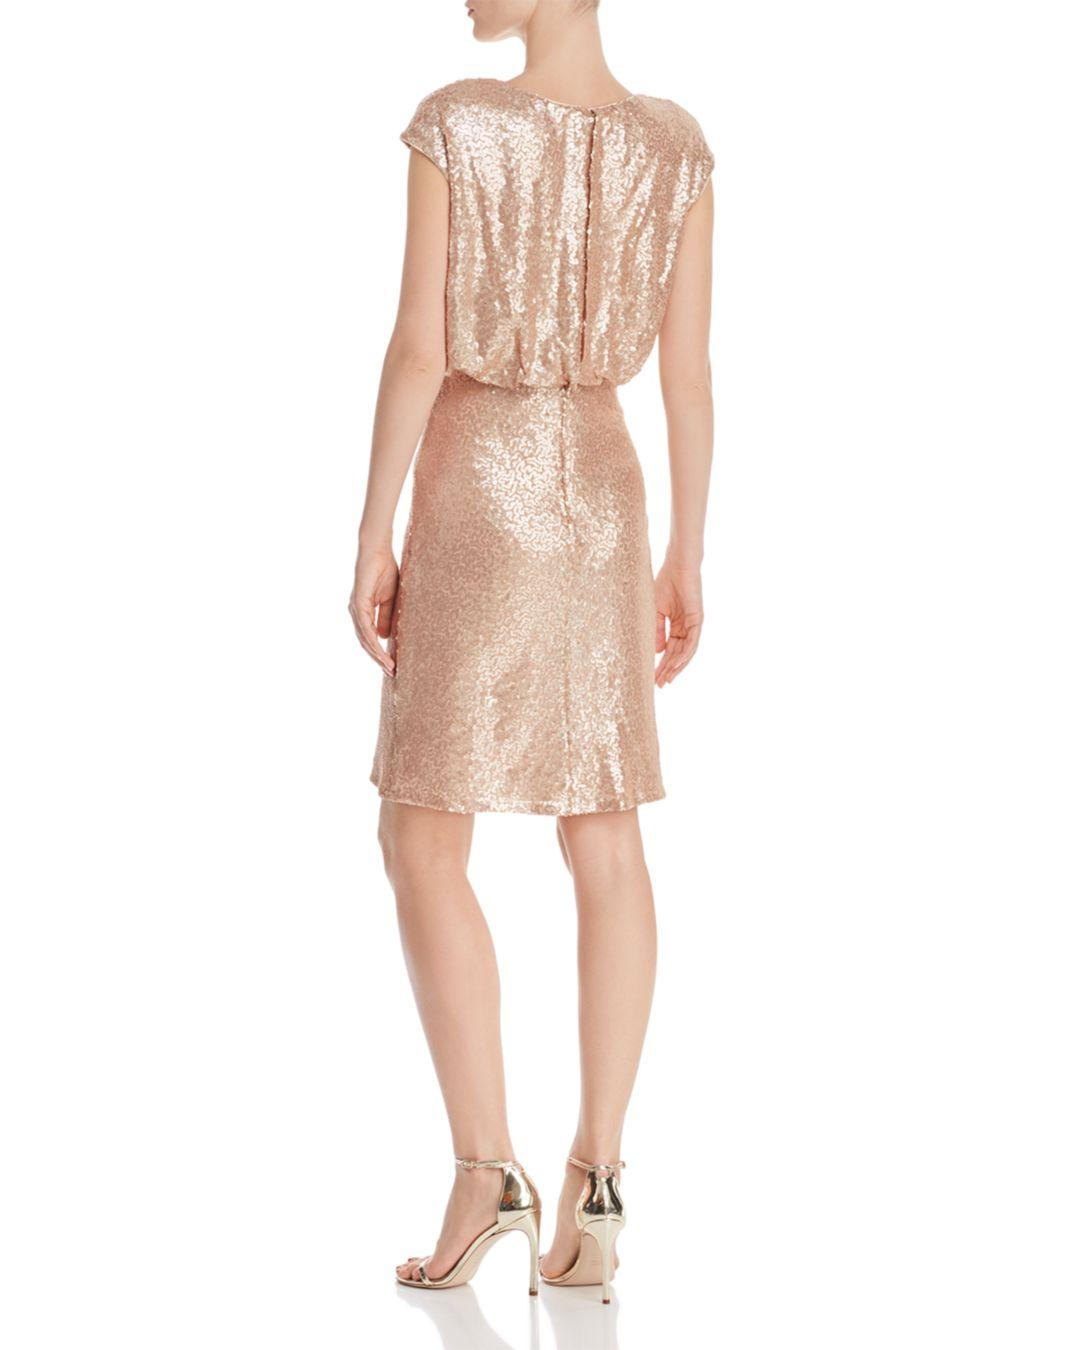 be0341d8a627 Tadashi Shoji Sequined Blouson Dress - Lyst